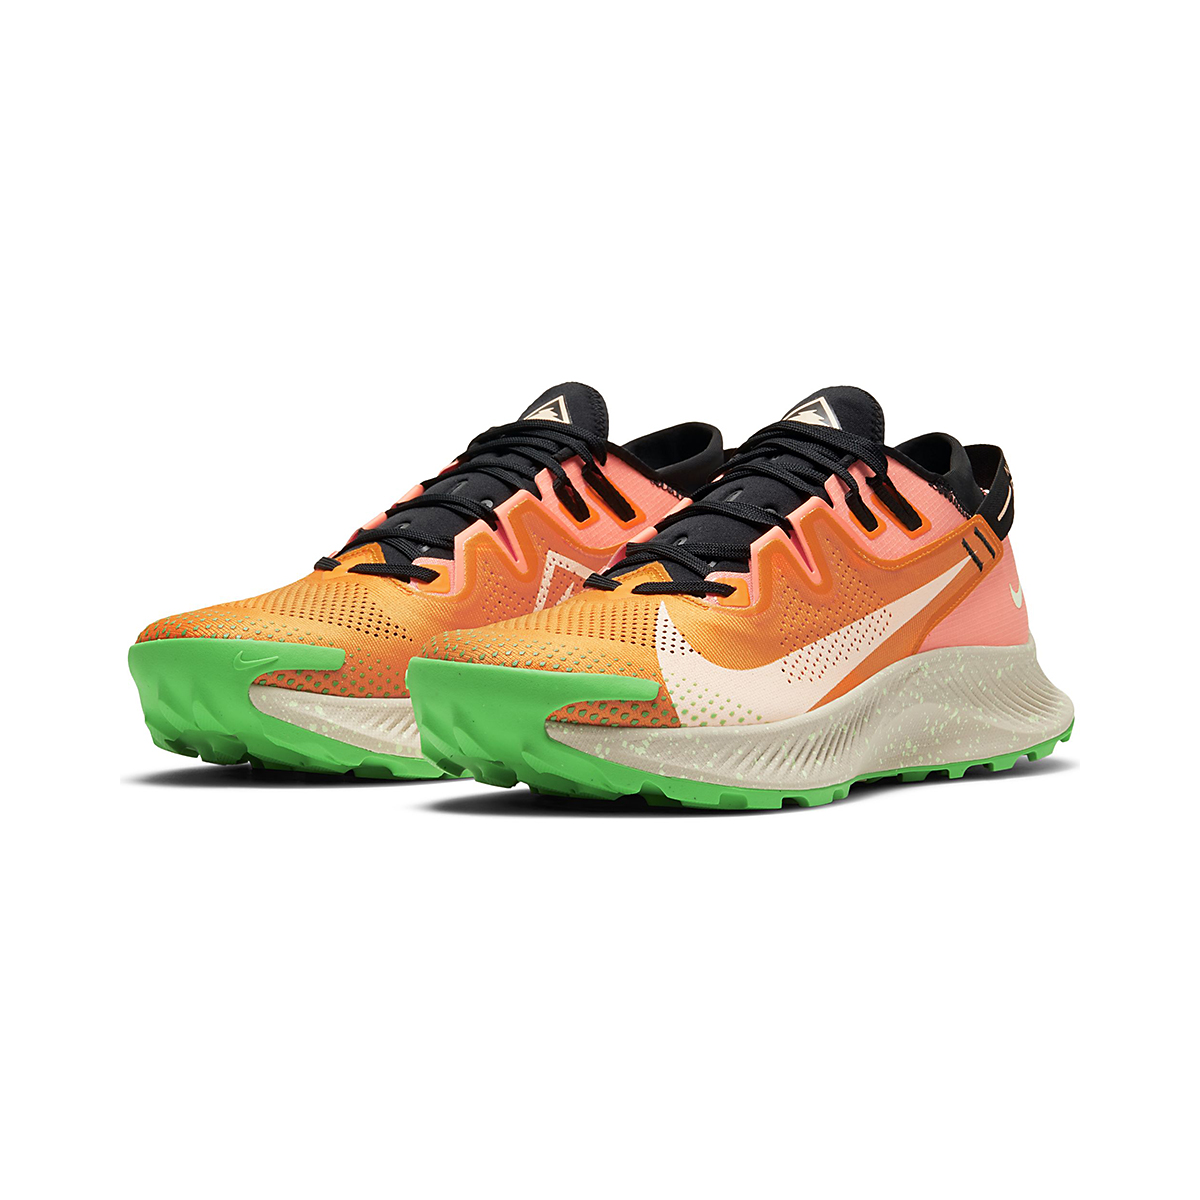 Men's Nike Pegasus Trail 2 Trail Running Shoe - Color: Kumquat/Crimson - Size: 6 - Width: Regular, Kumquat/Crimson, large, image 3